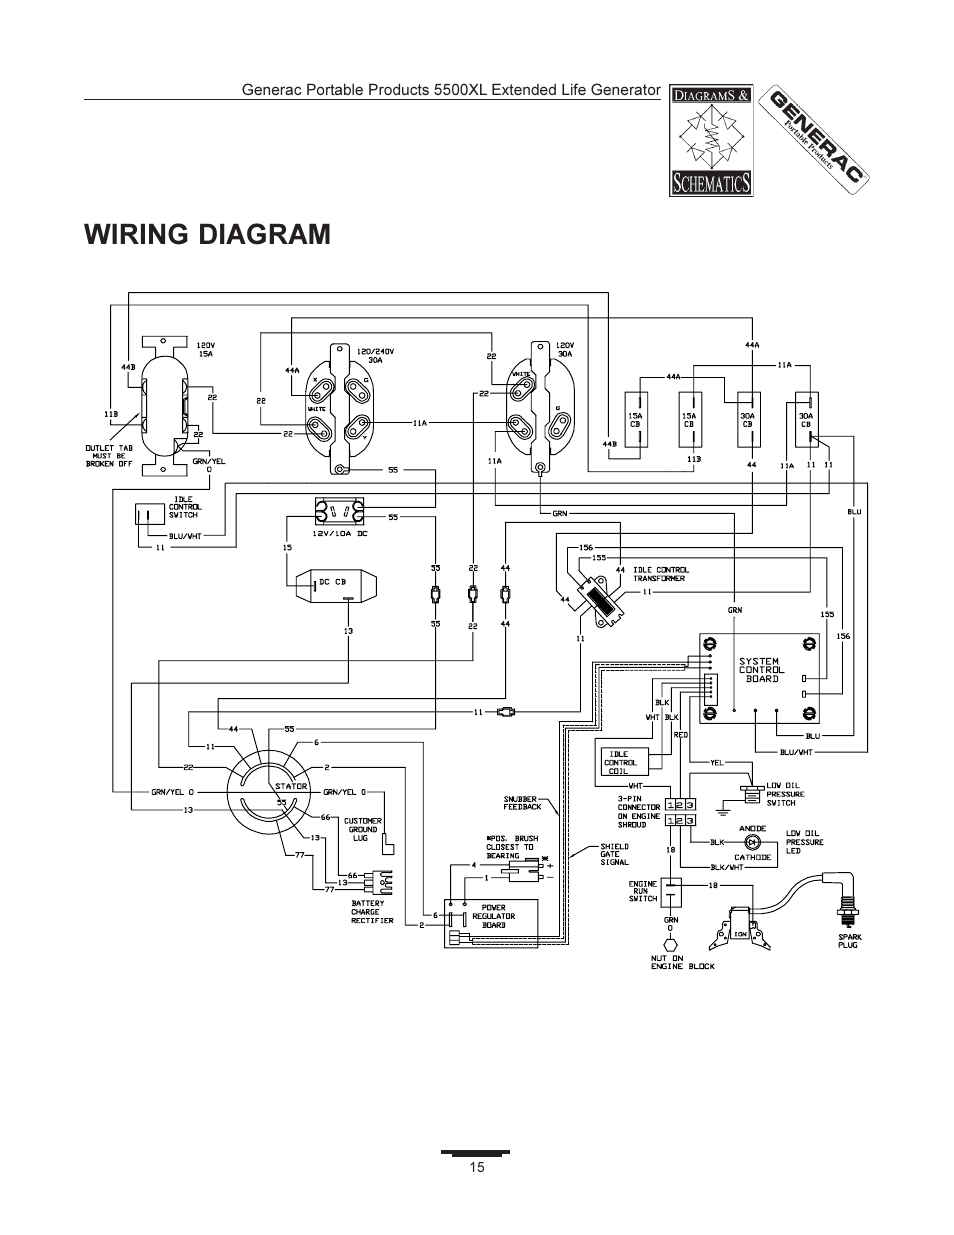 generac generator wiring diagram dakota digital | 5500xl user manual page 15 / 18